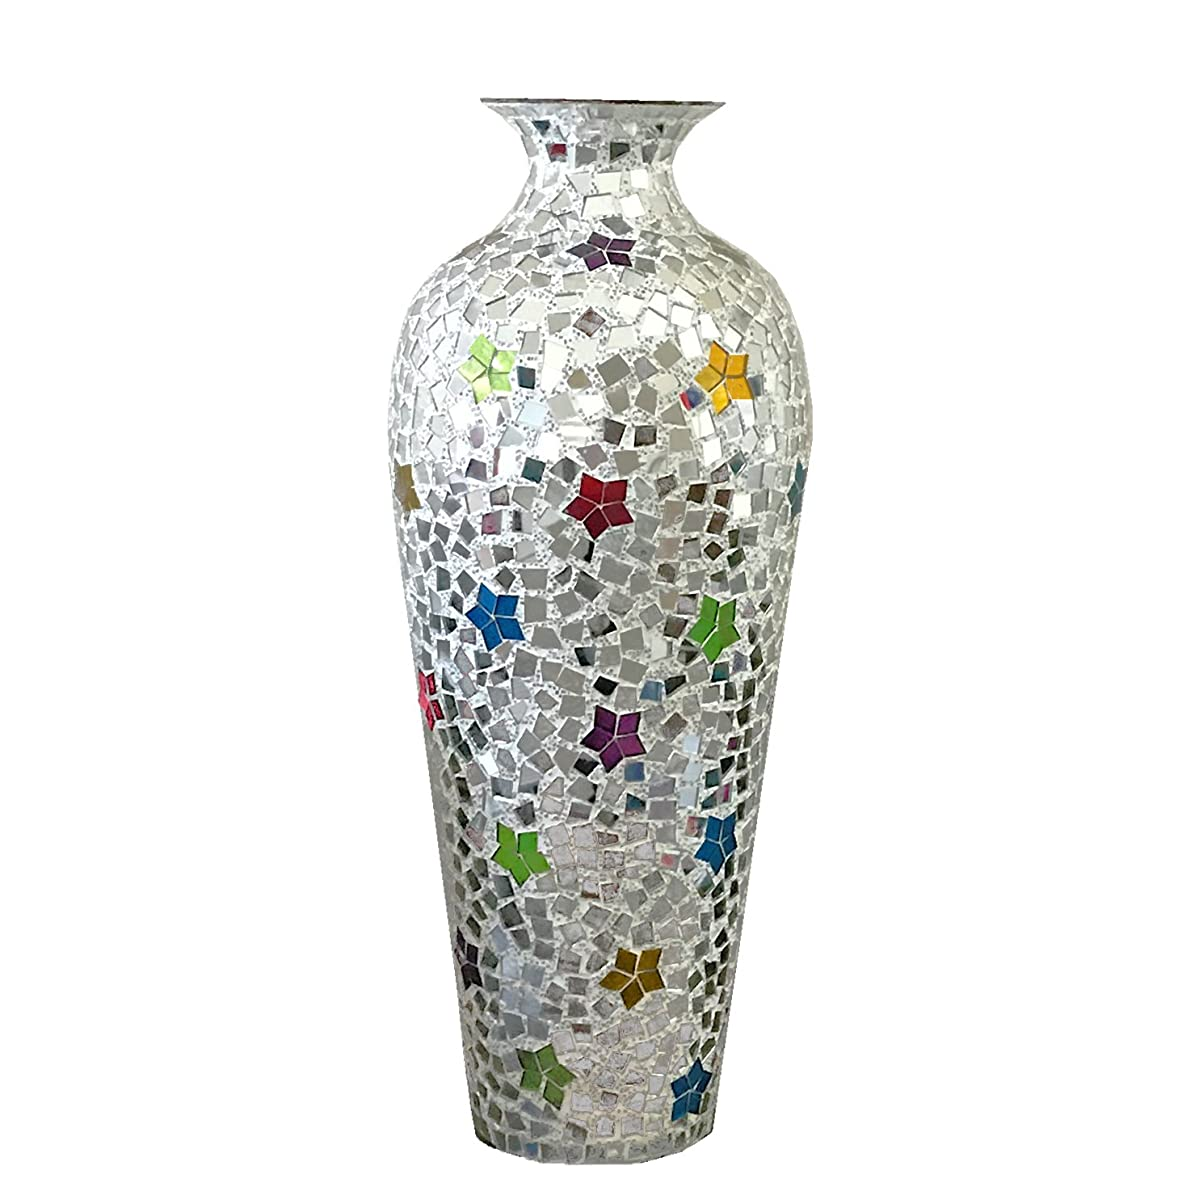 DecorShore Andalusian Vase -Sparkling Metal Vase with Moorish Floral Pattern Glass Mosaic Inlay, 20 in. Decorative Vase, Designer Vase (Rainbow)